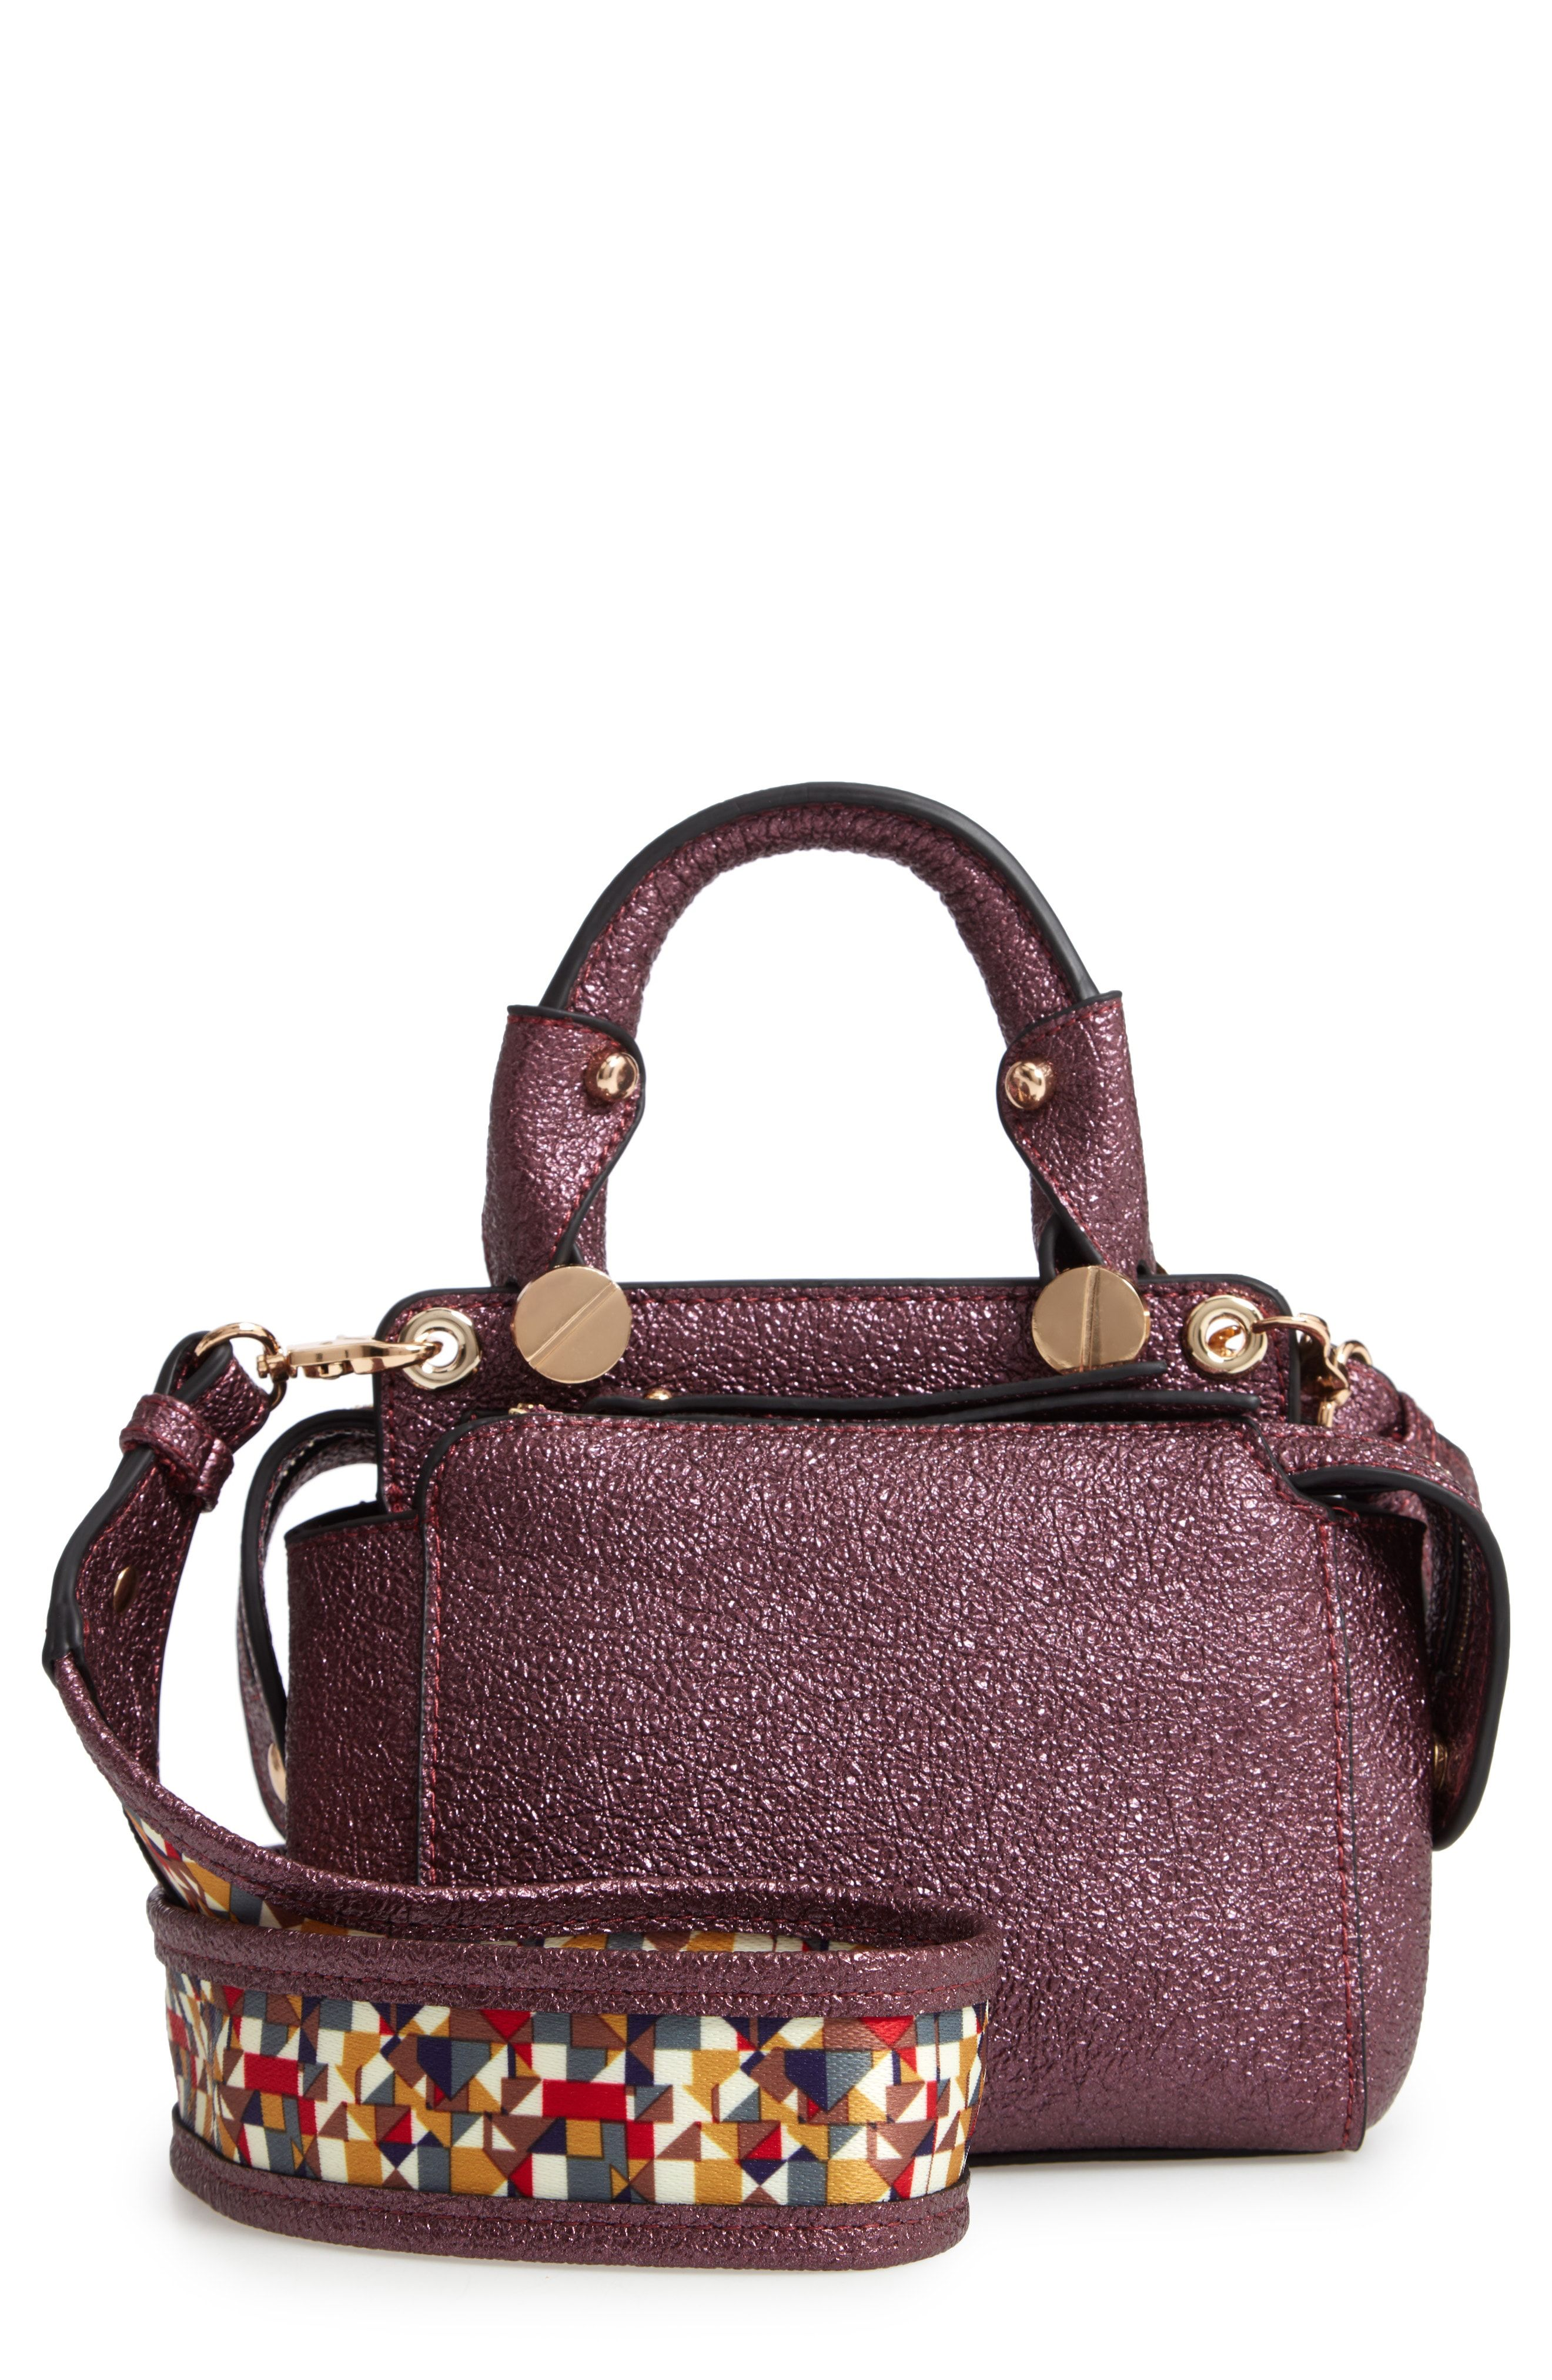 b4c1d33fc940 Sondra Roberts Metallic Faux Leather Mini Satchel available at  Nordstrom